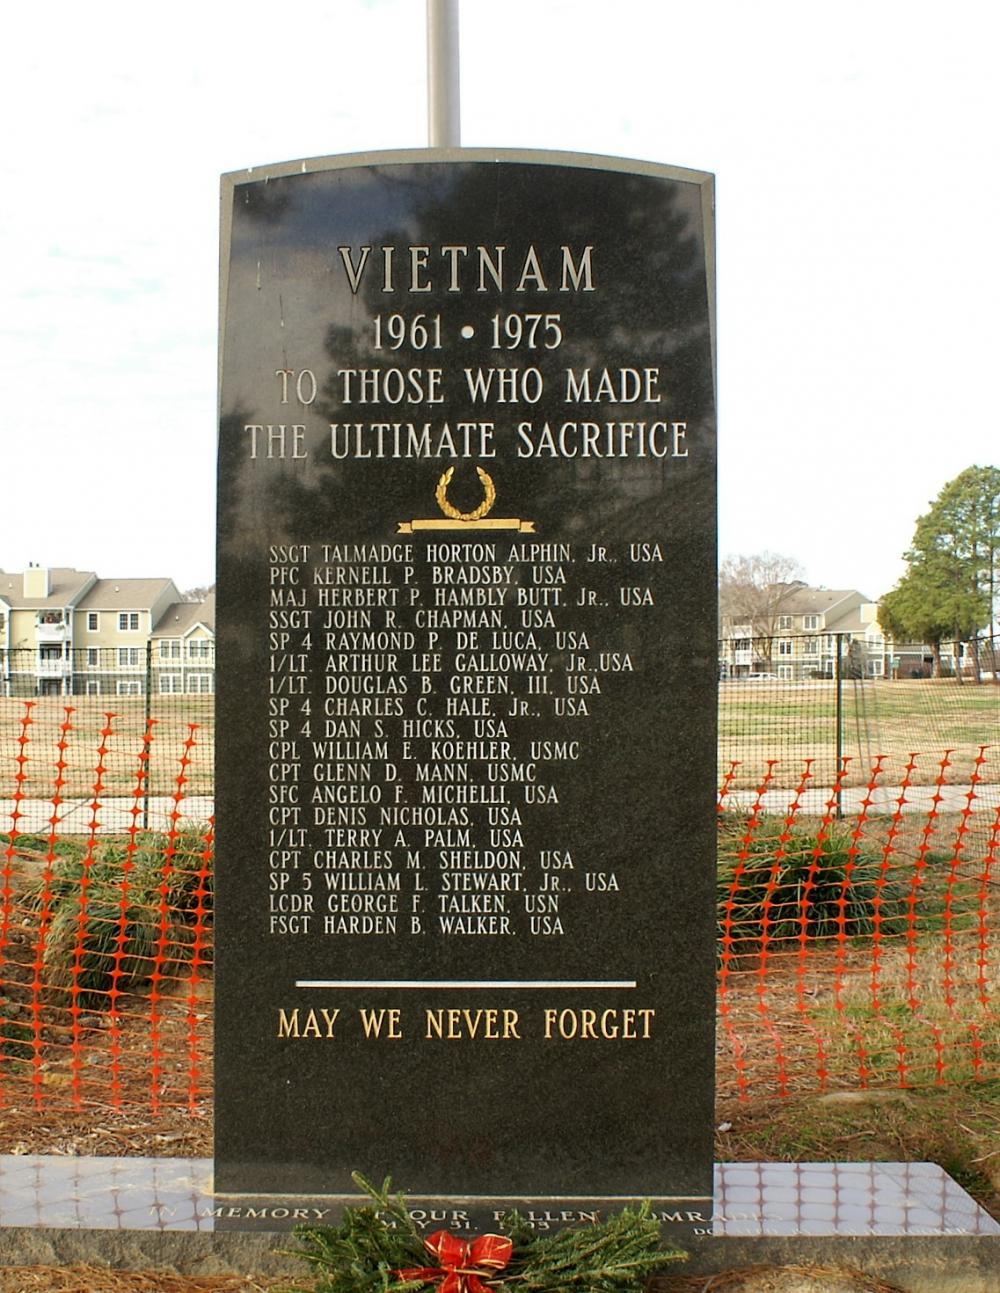 Memorial to Honor Local Veterans Killed in Action in VietNam